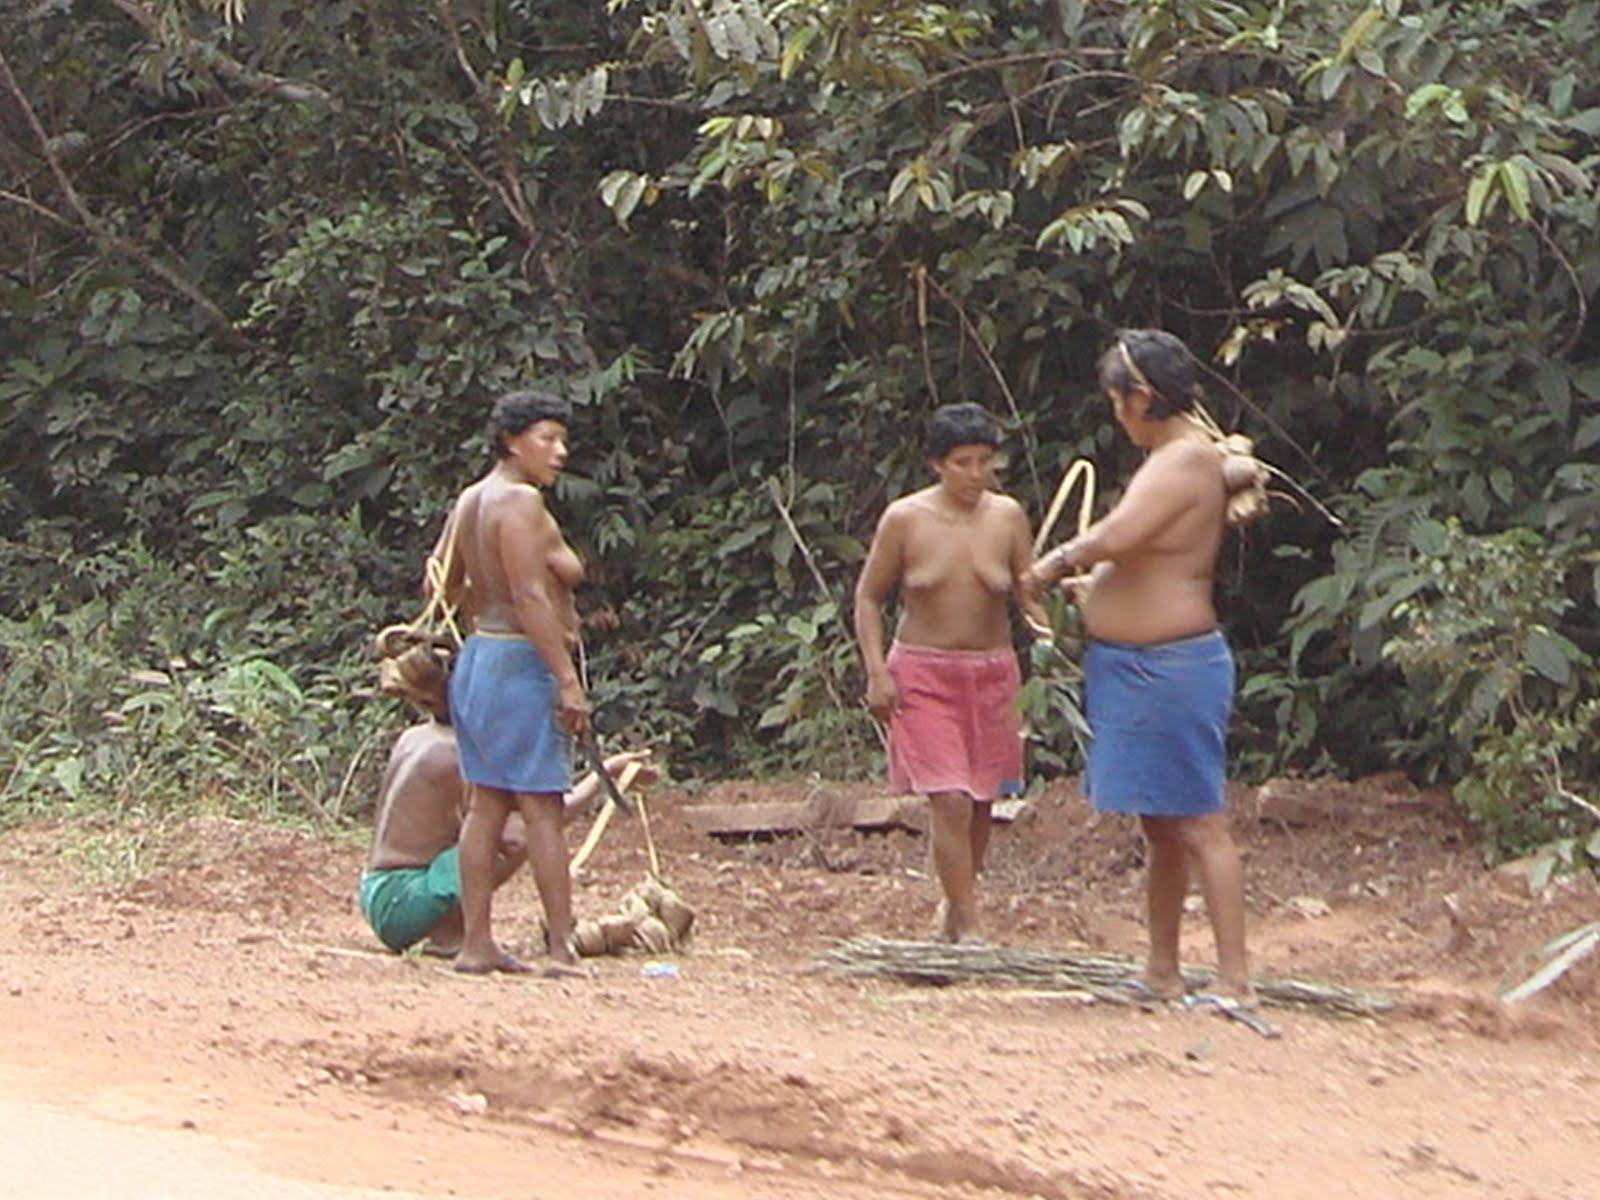 Aparador Em Ingles ~ VUELTA POR SUDAMERICA El desafío Brasil